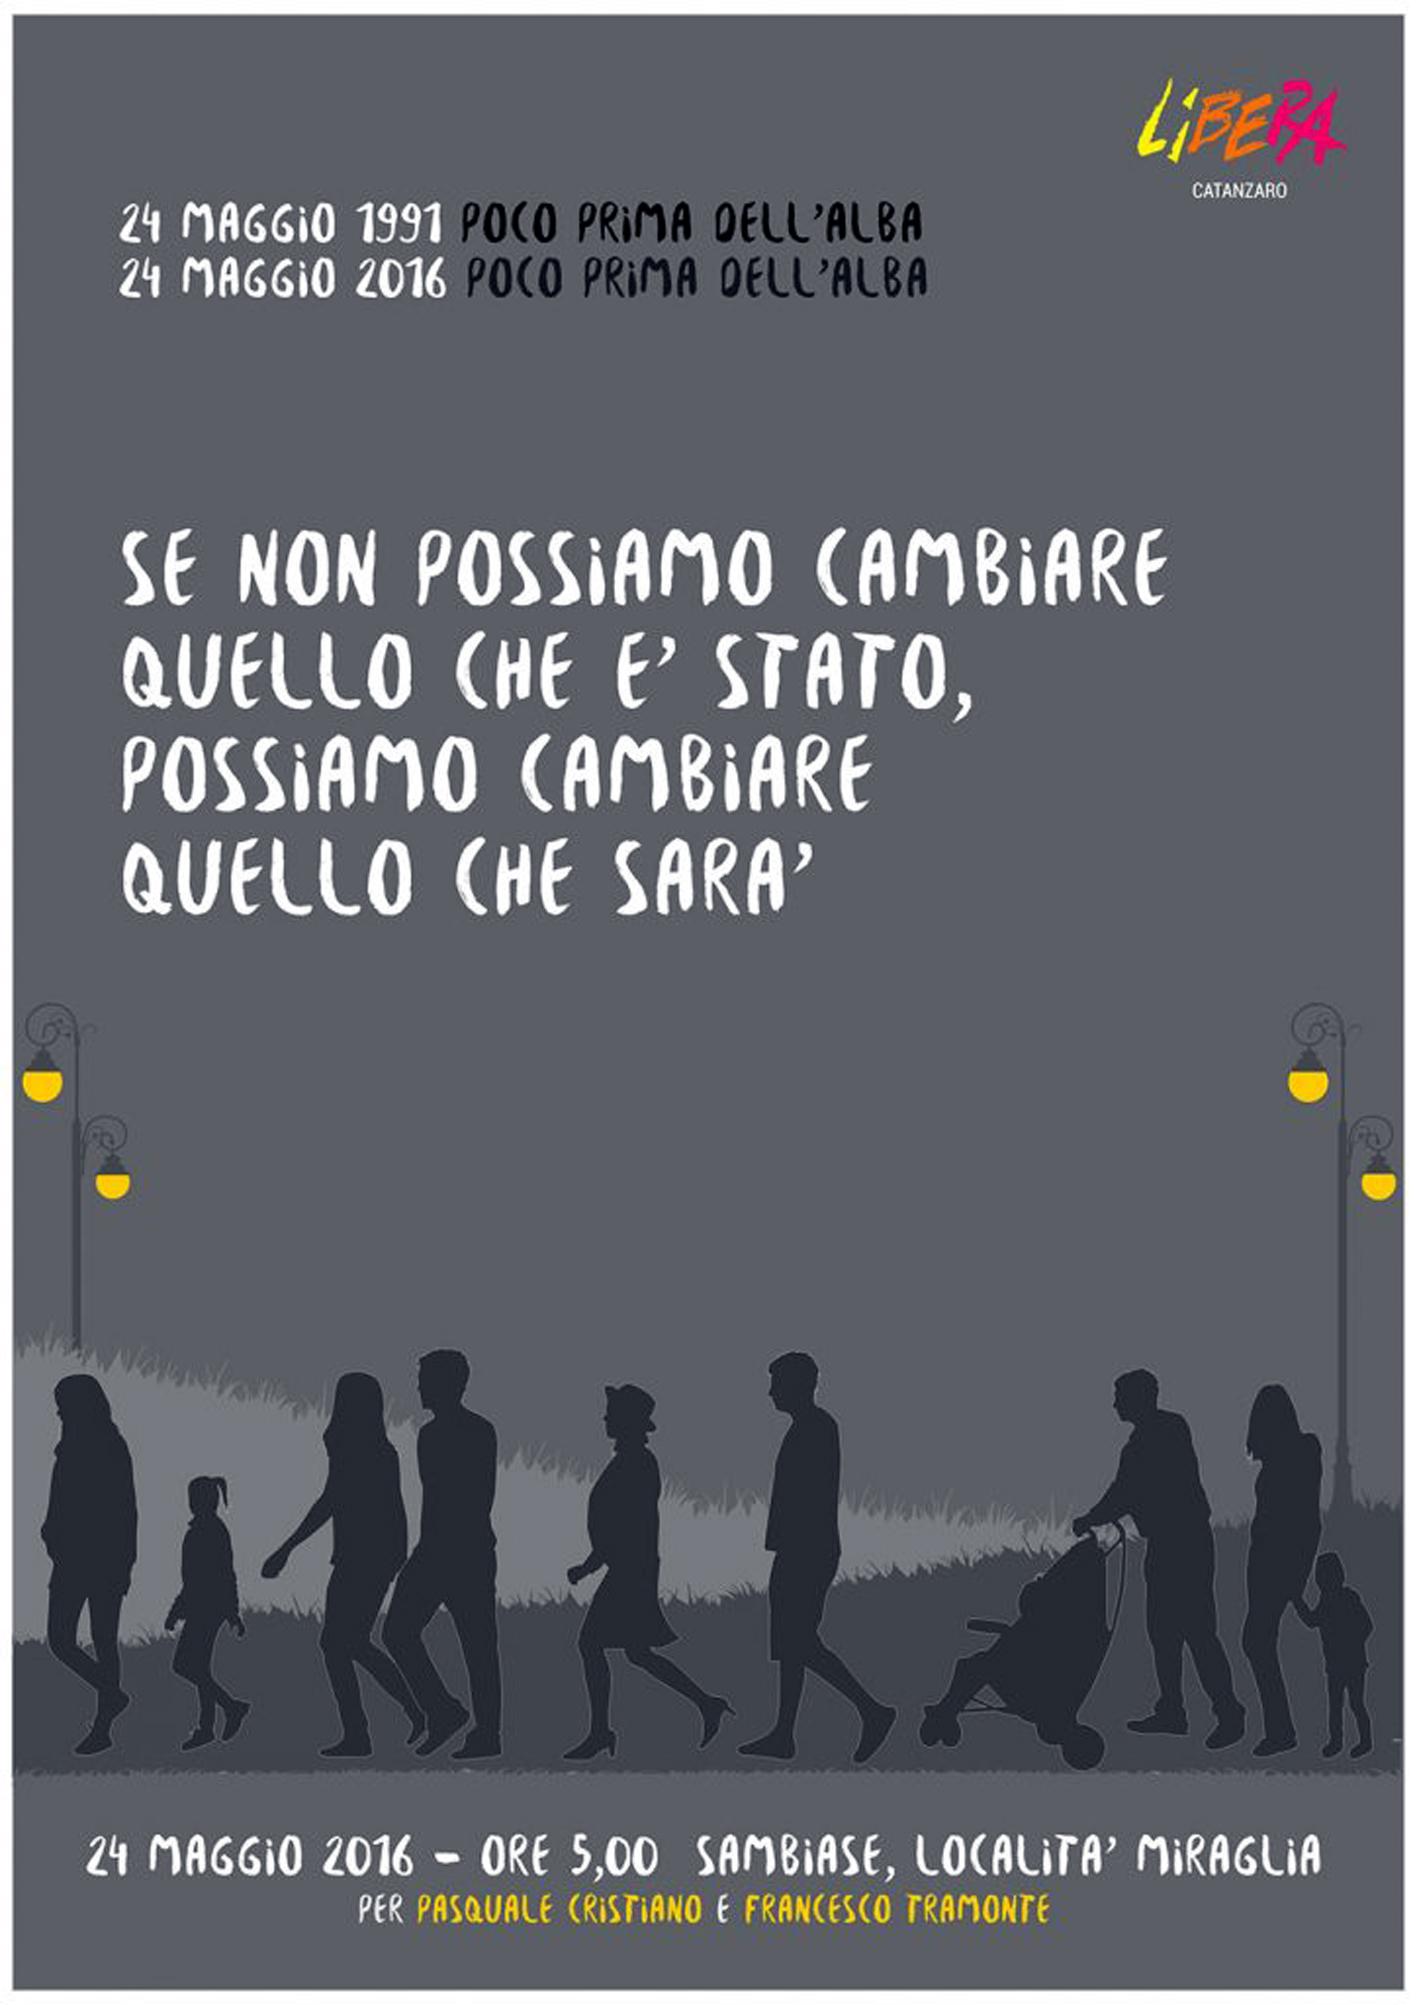 ManifestoLibera-724x1024